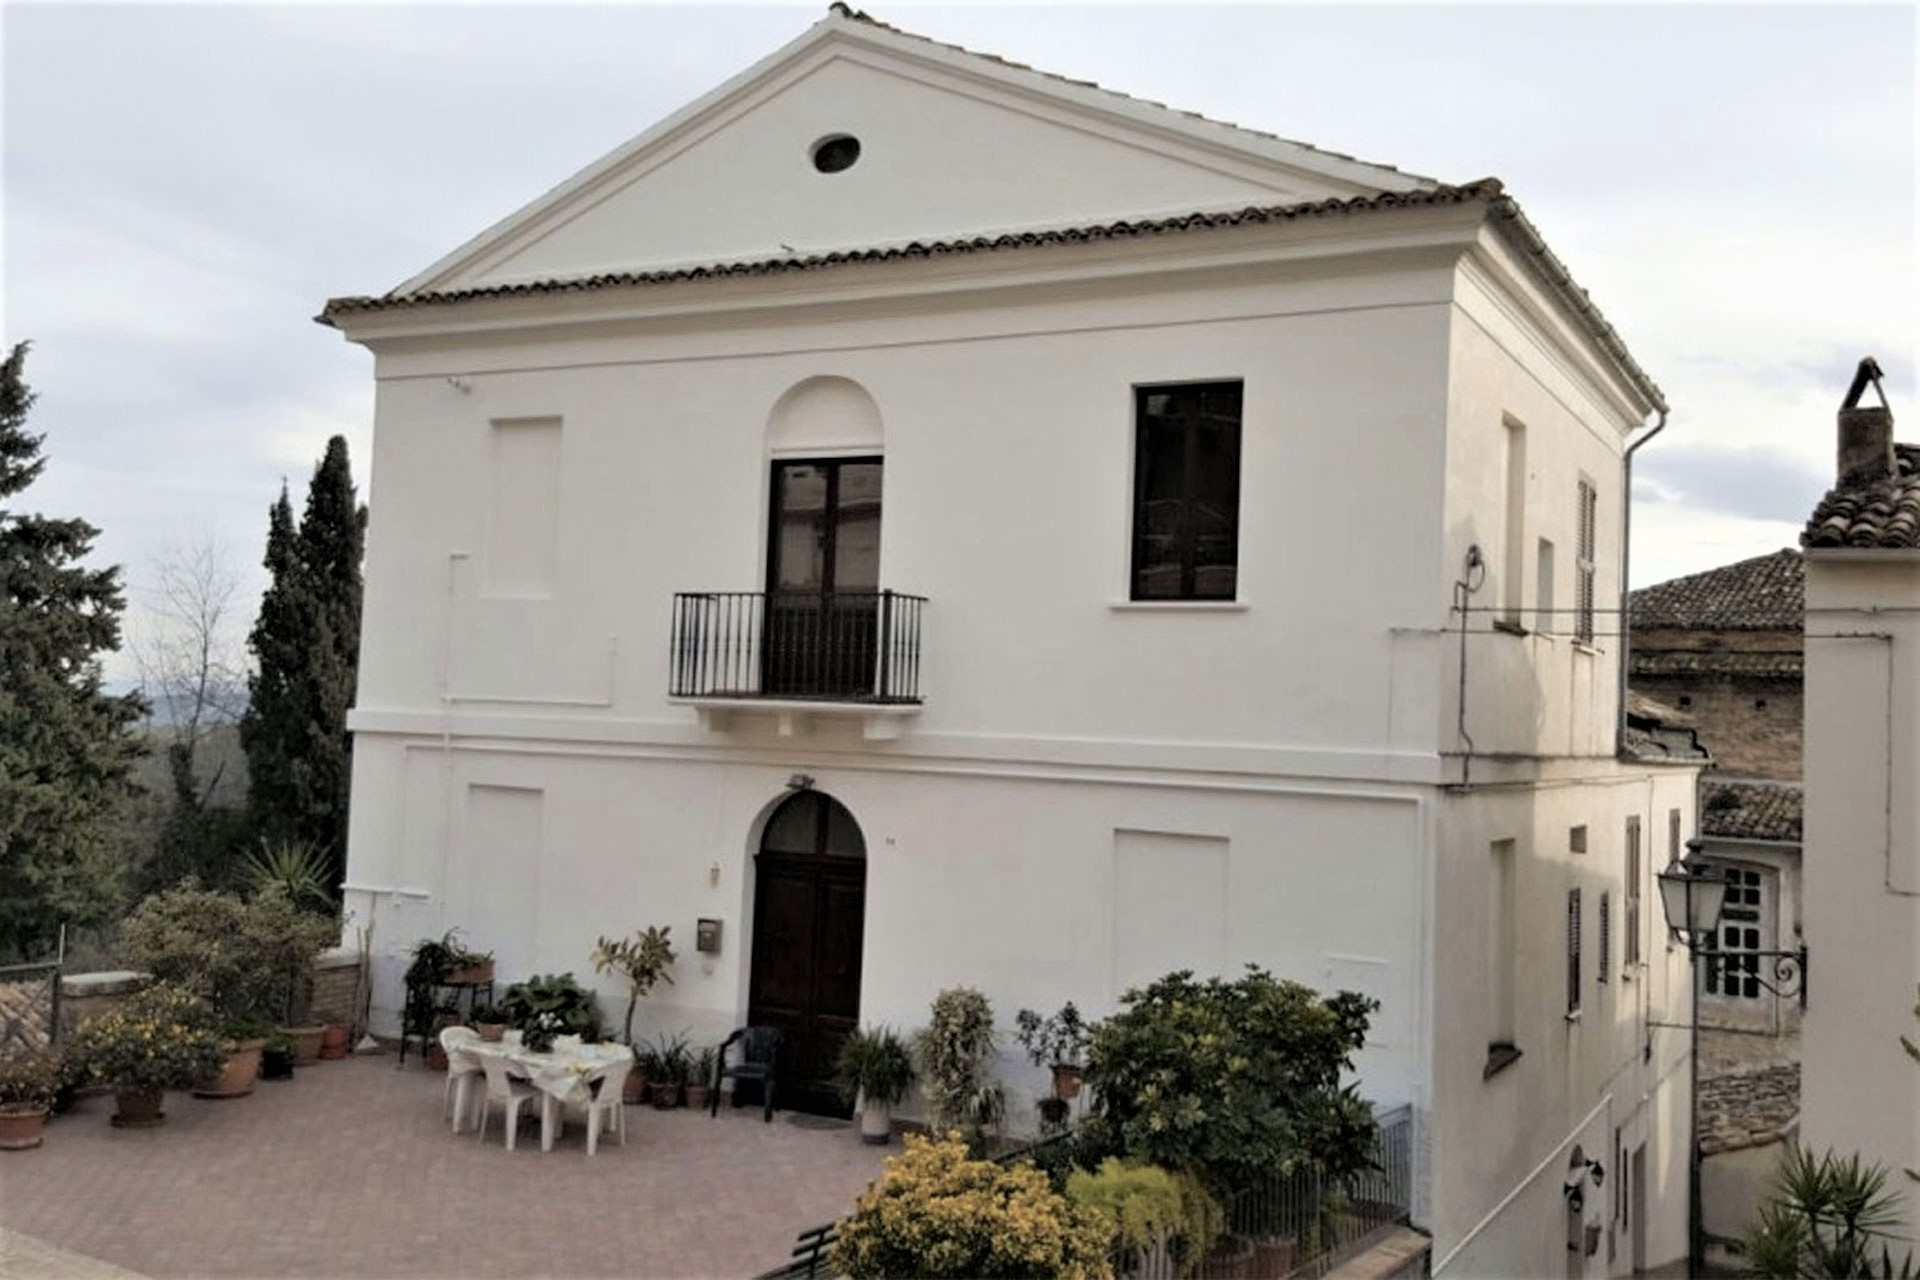 Townhouse Townhouse for sale Loreto Aprutino (PE), Casa Diamante - Loreto Aprutino - EUR 274.565 10